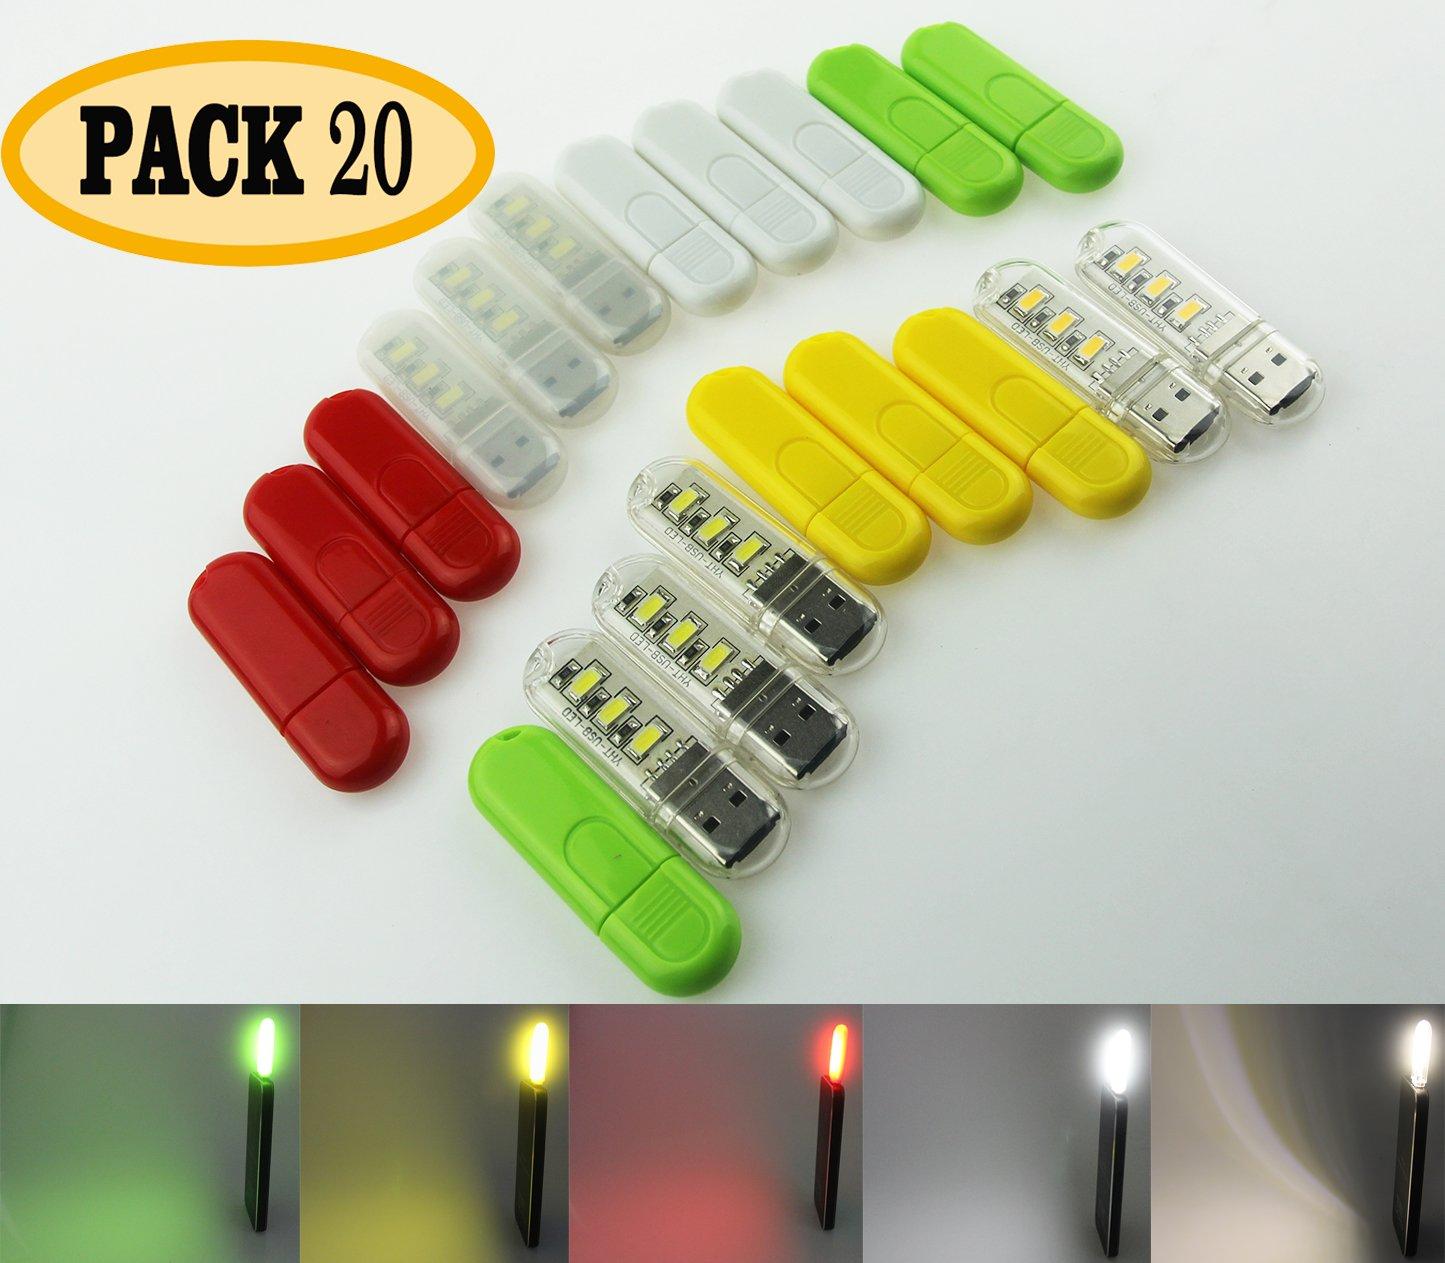 ECAREE ULF0200100 Hot USB Portable Lamp Set, USB Night Light, Little Creative USB Reading Lamp, LED for Laptop - Pack of 20, Colorful